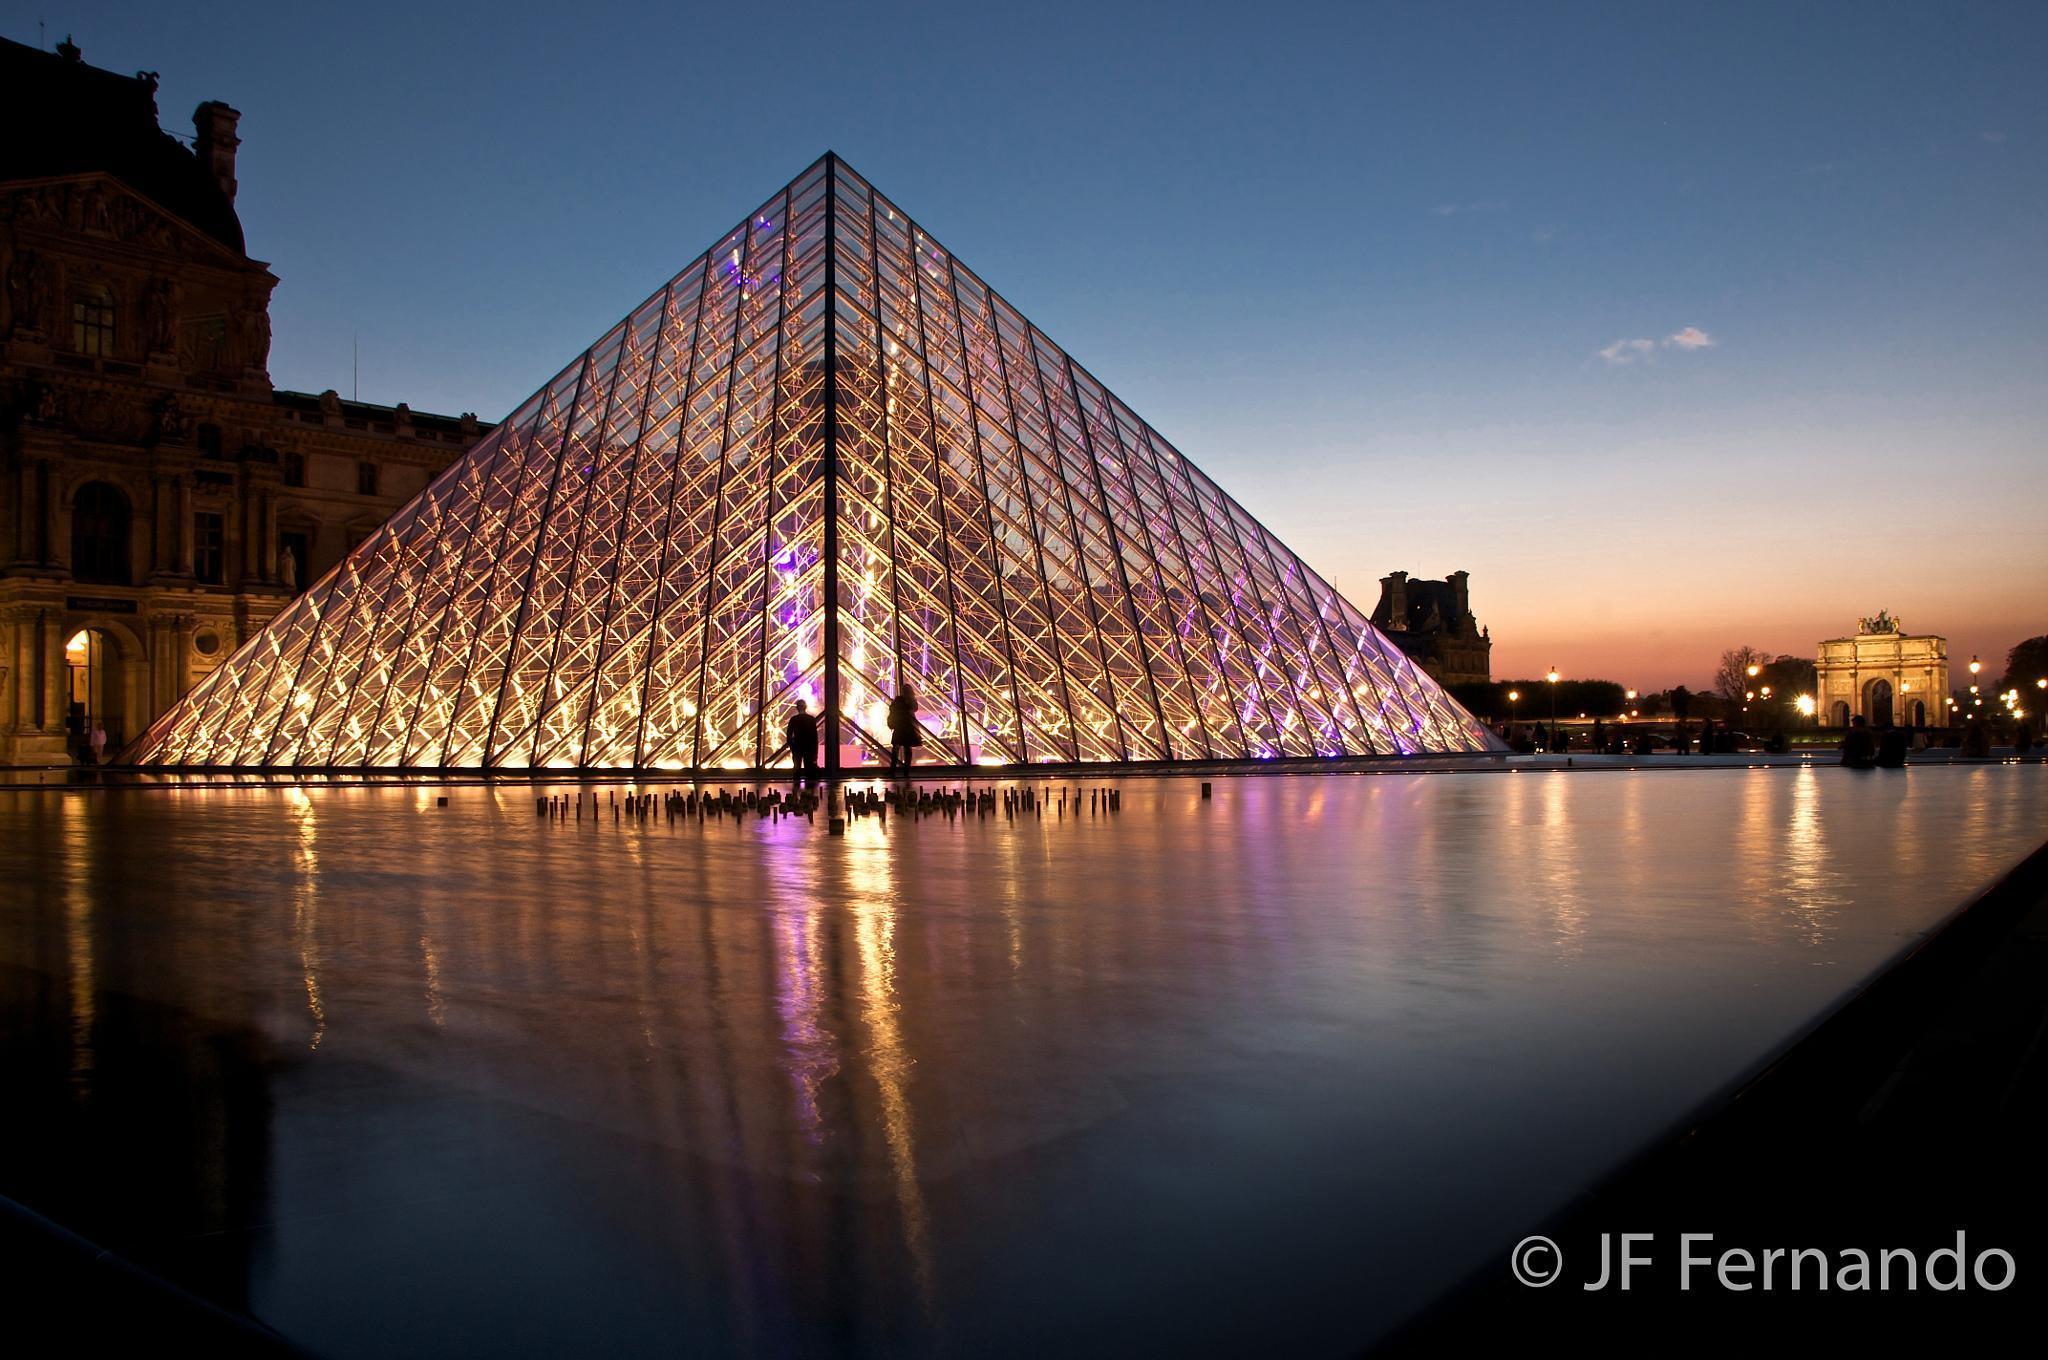 sunset by JF Fernando